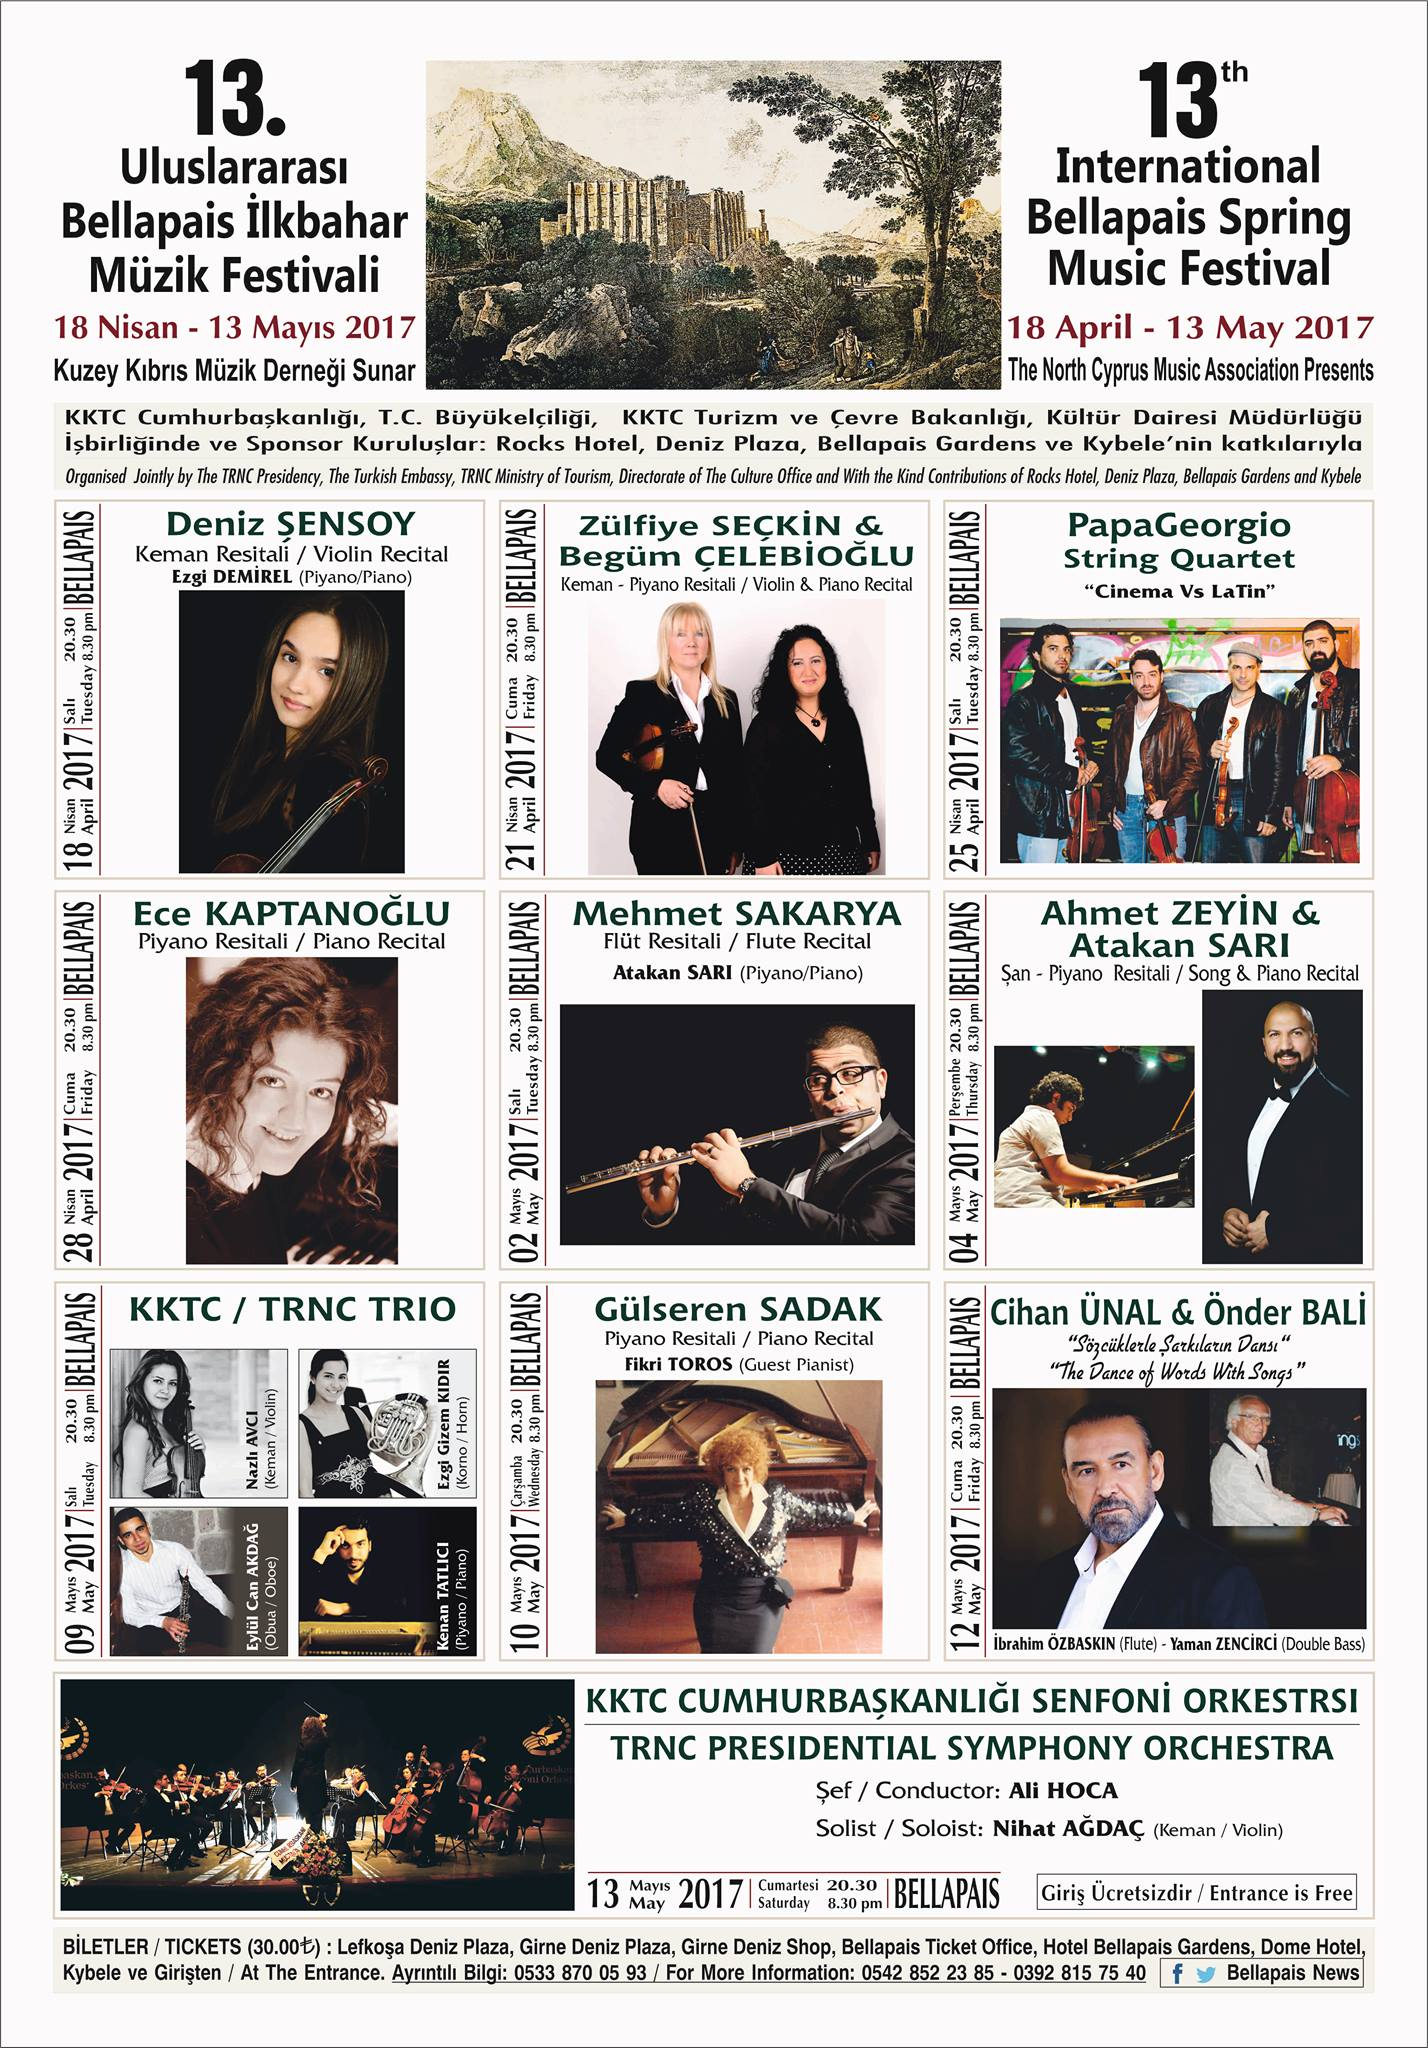 13th International Bellapais Spring Music Festival